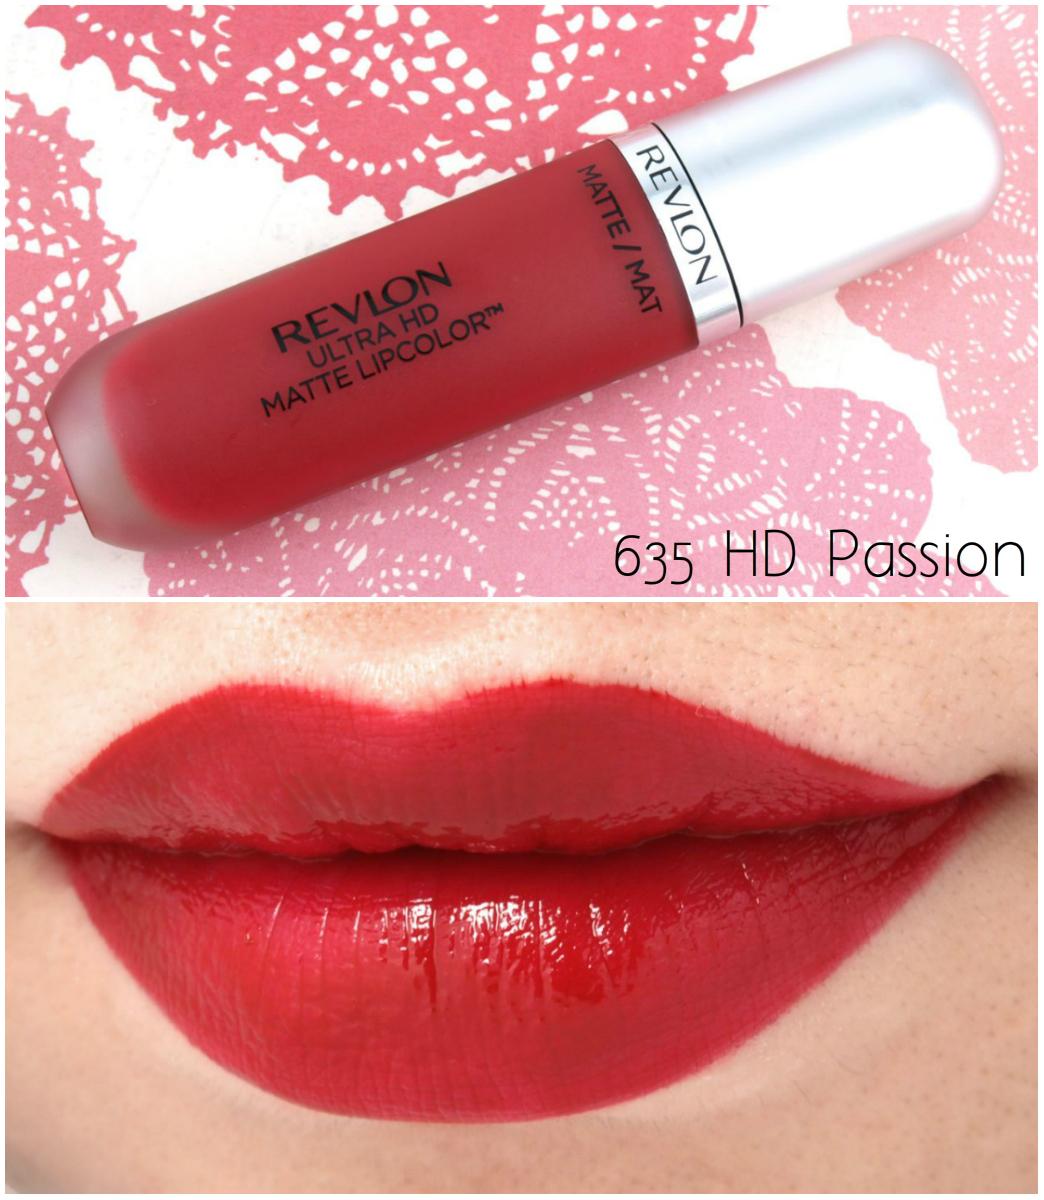 revlon-ultra-hd-matte-lipcolor-review-swatches-635-passion.jpg (1044×1200)